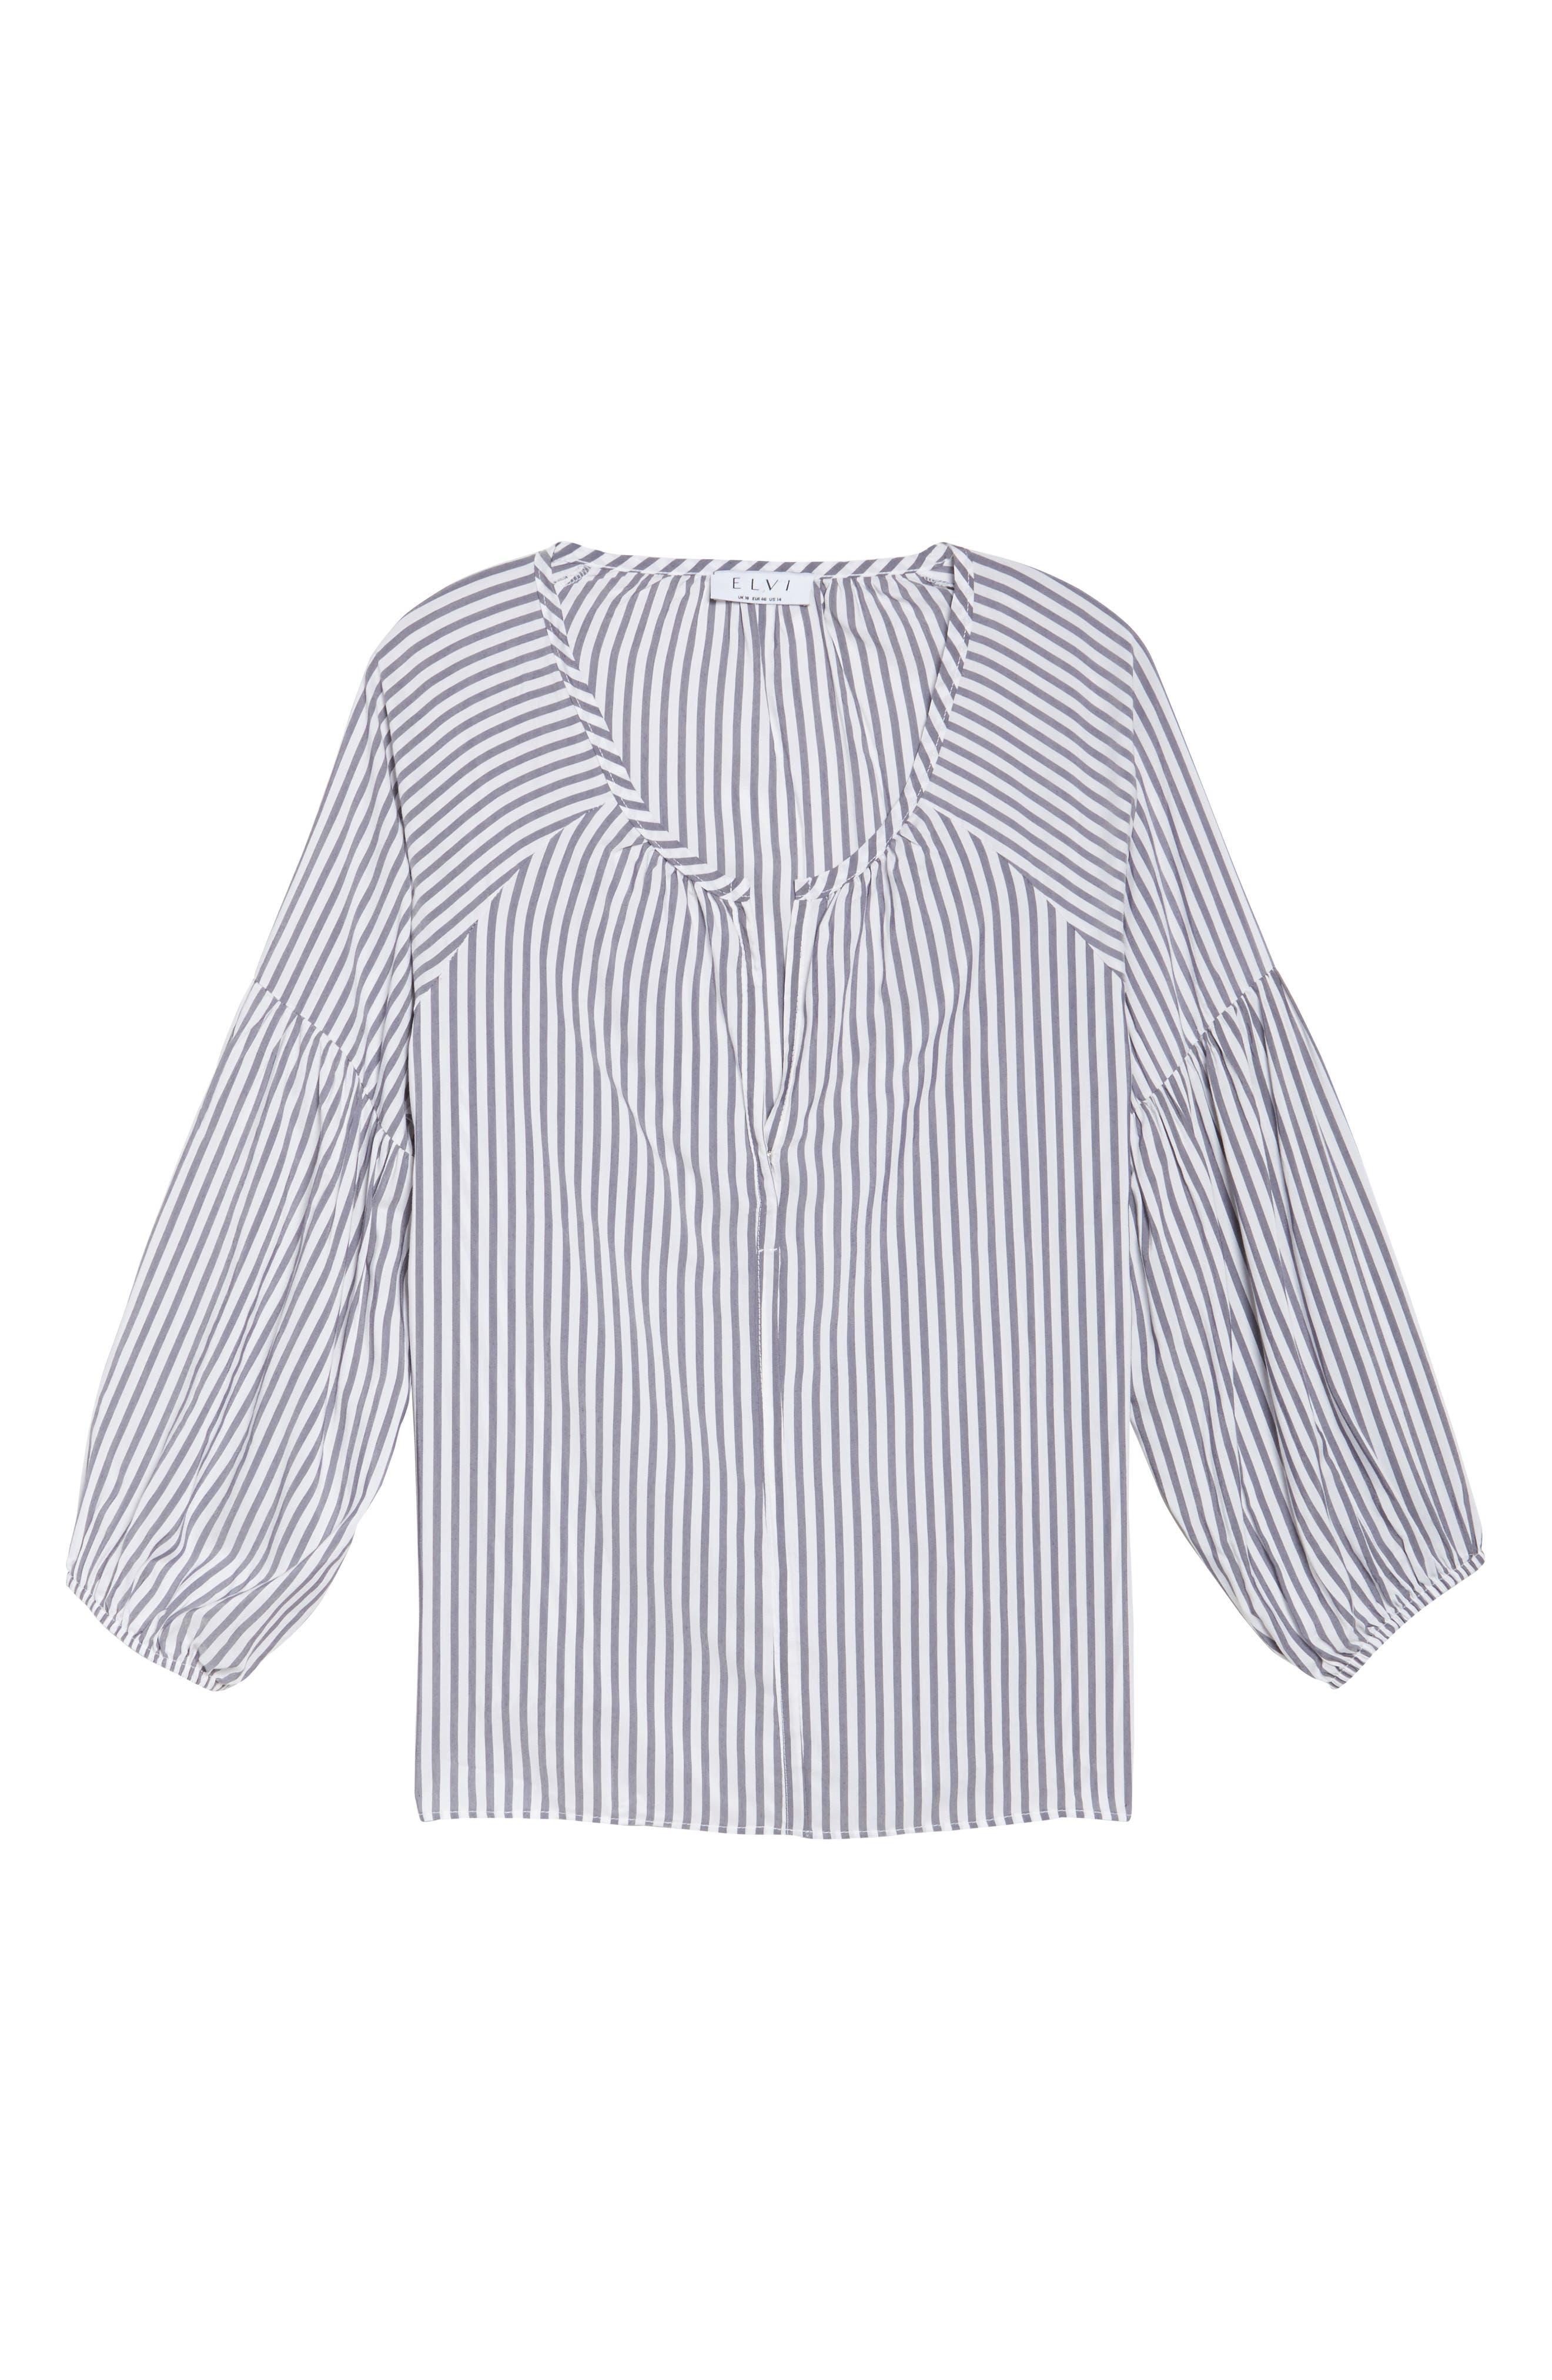 Gathered Sleeve Stripe Blouse,                             Alternate thumbnail 6, color,                             100